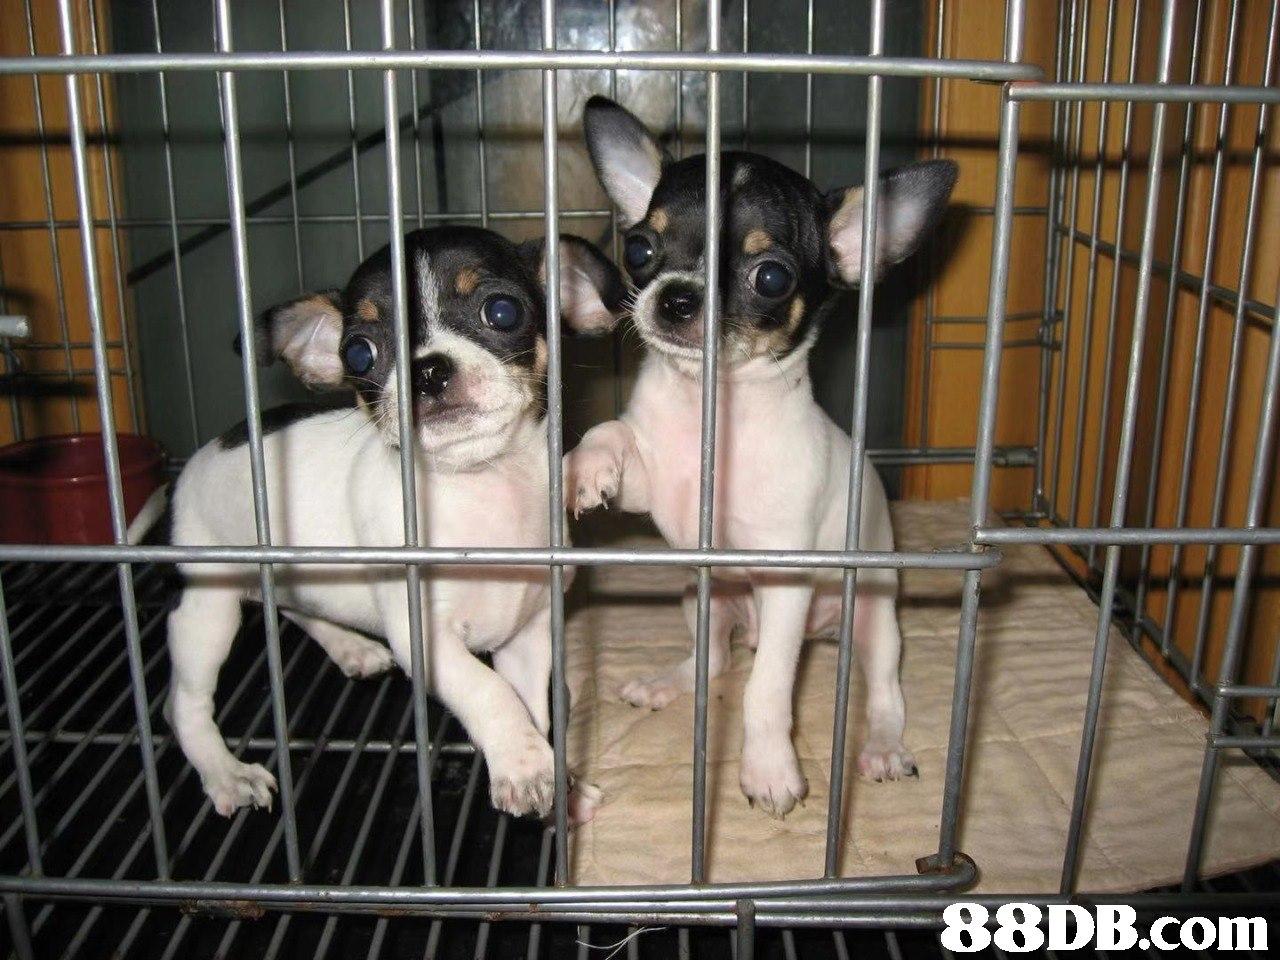 Mammal,Dog,Vertebrate,Canidae,Dog breed